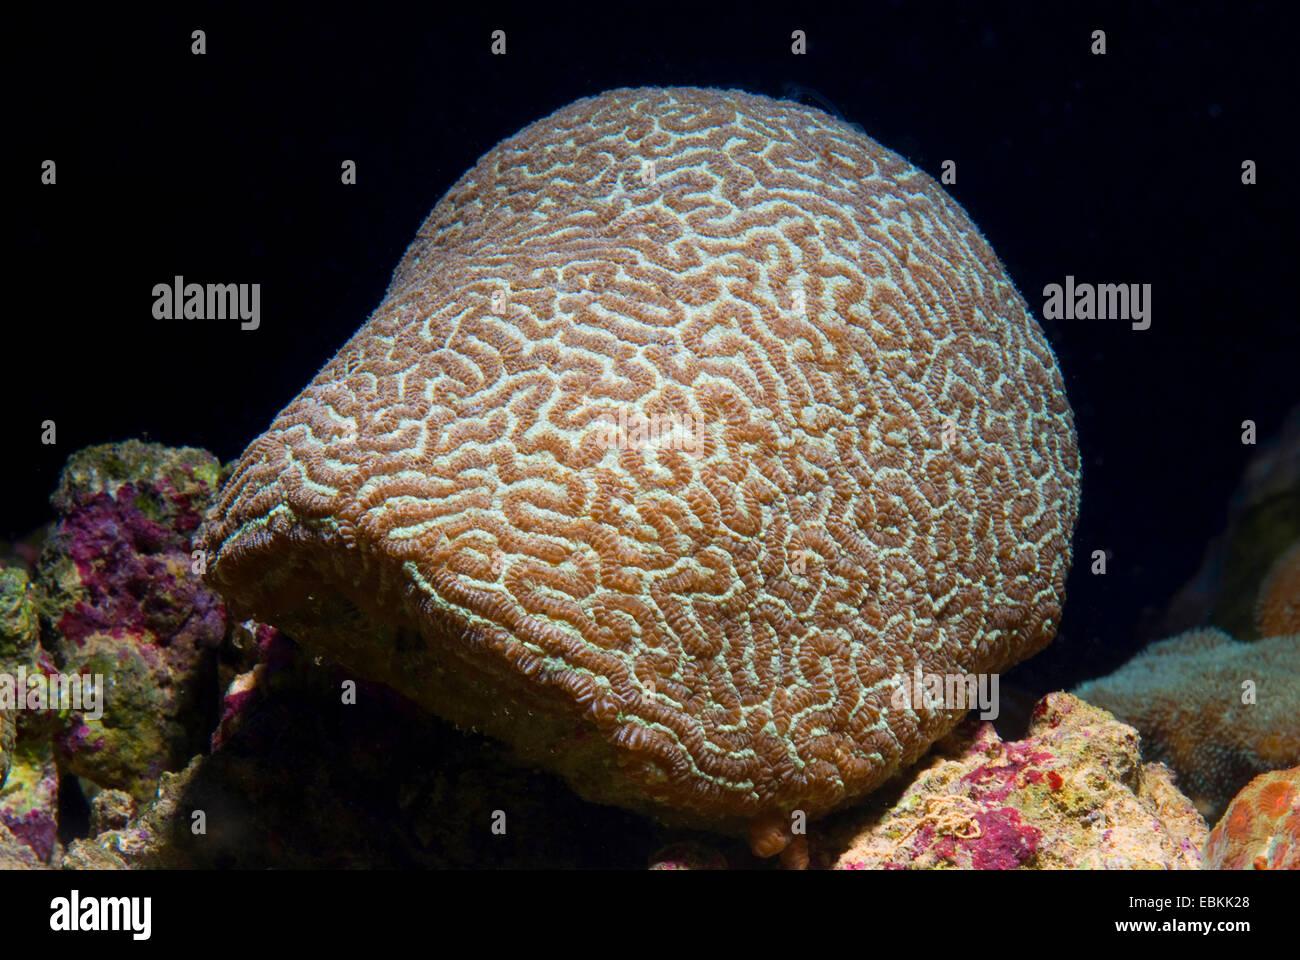 Stony Coral (Leptoria phrygia), side view - Stock Image